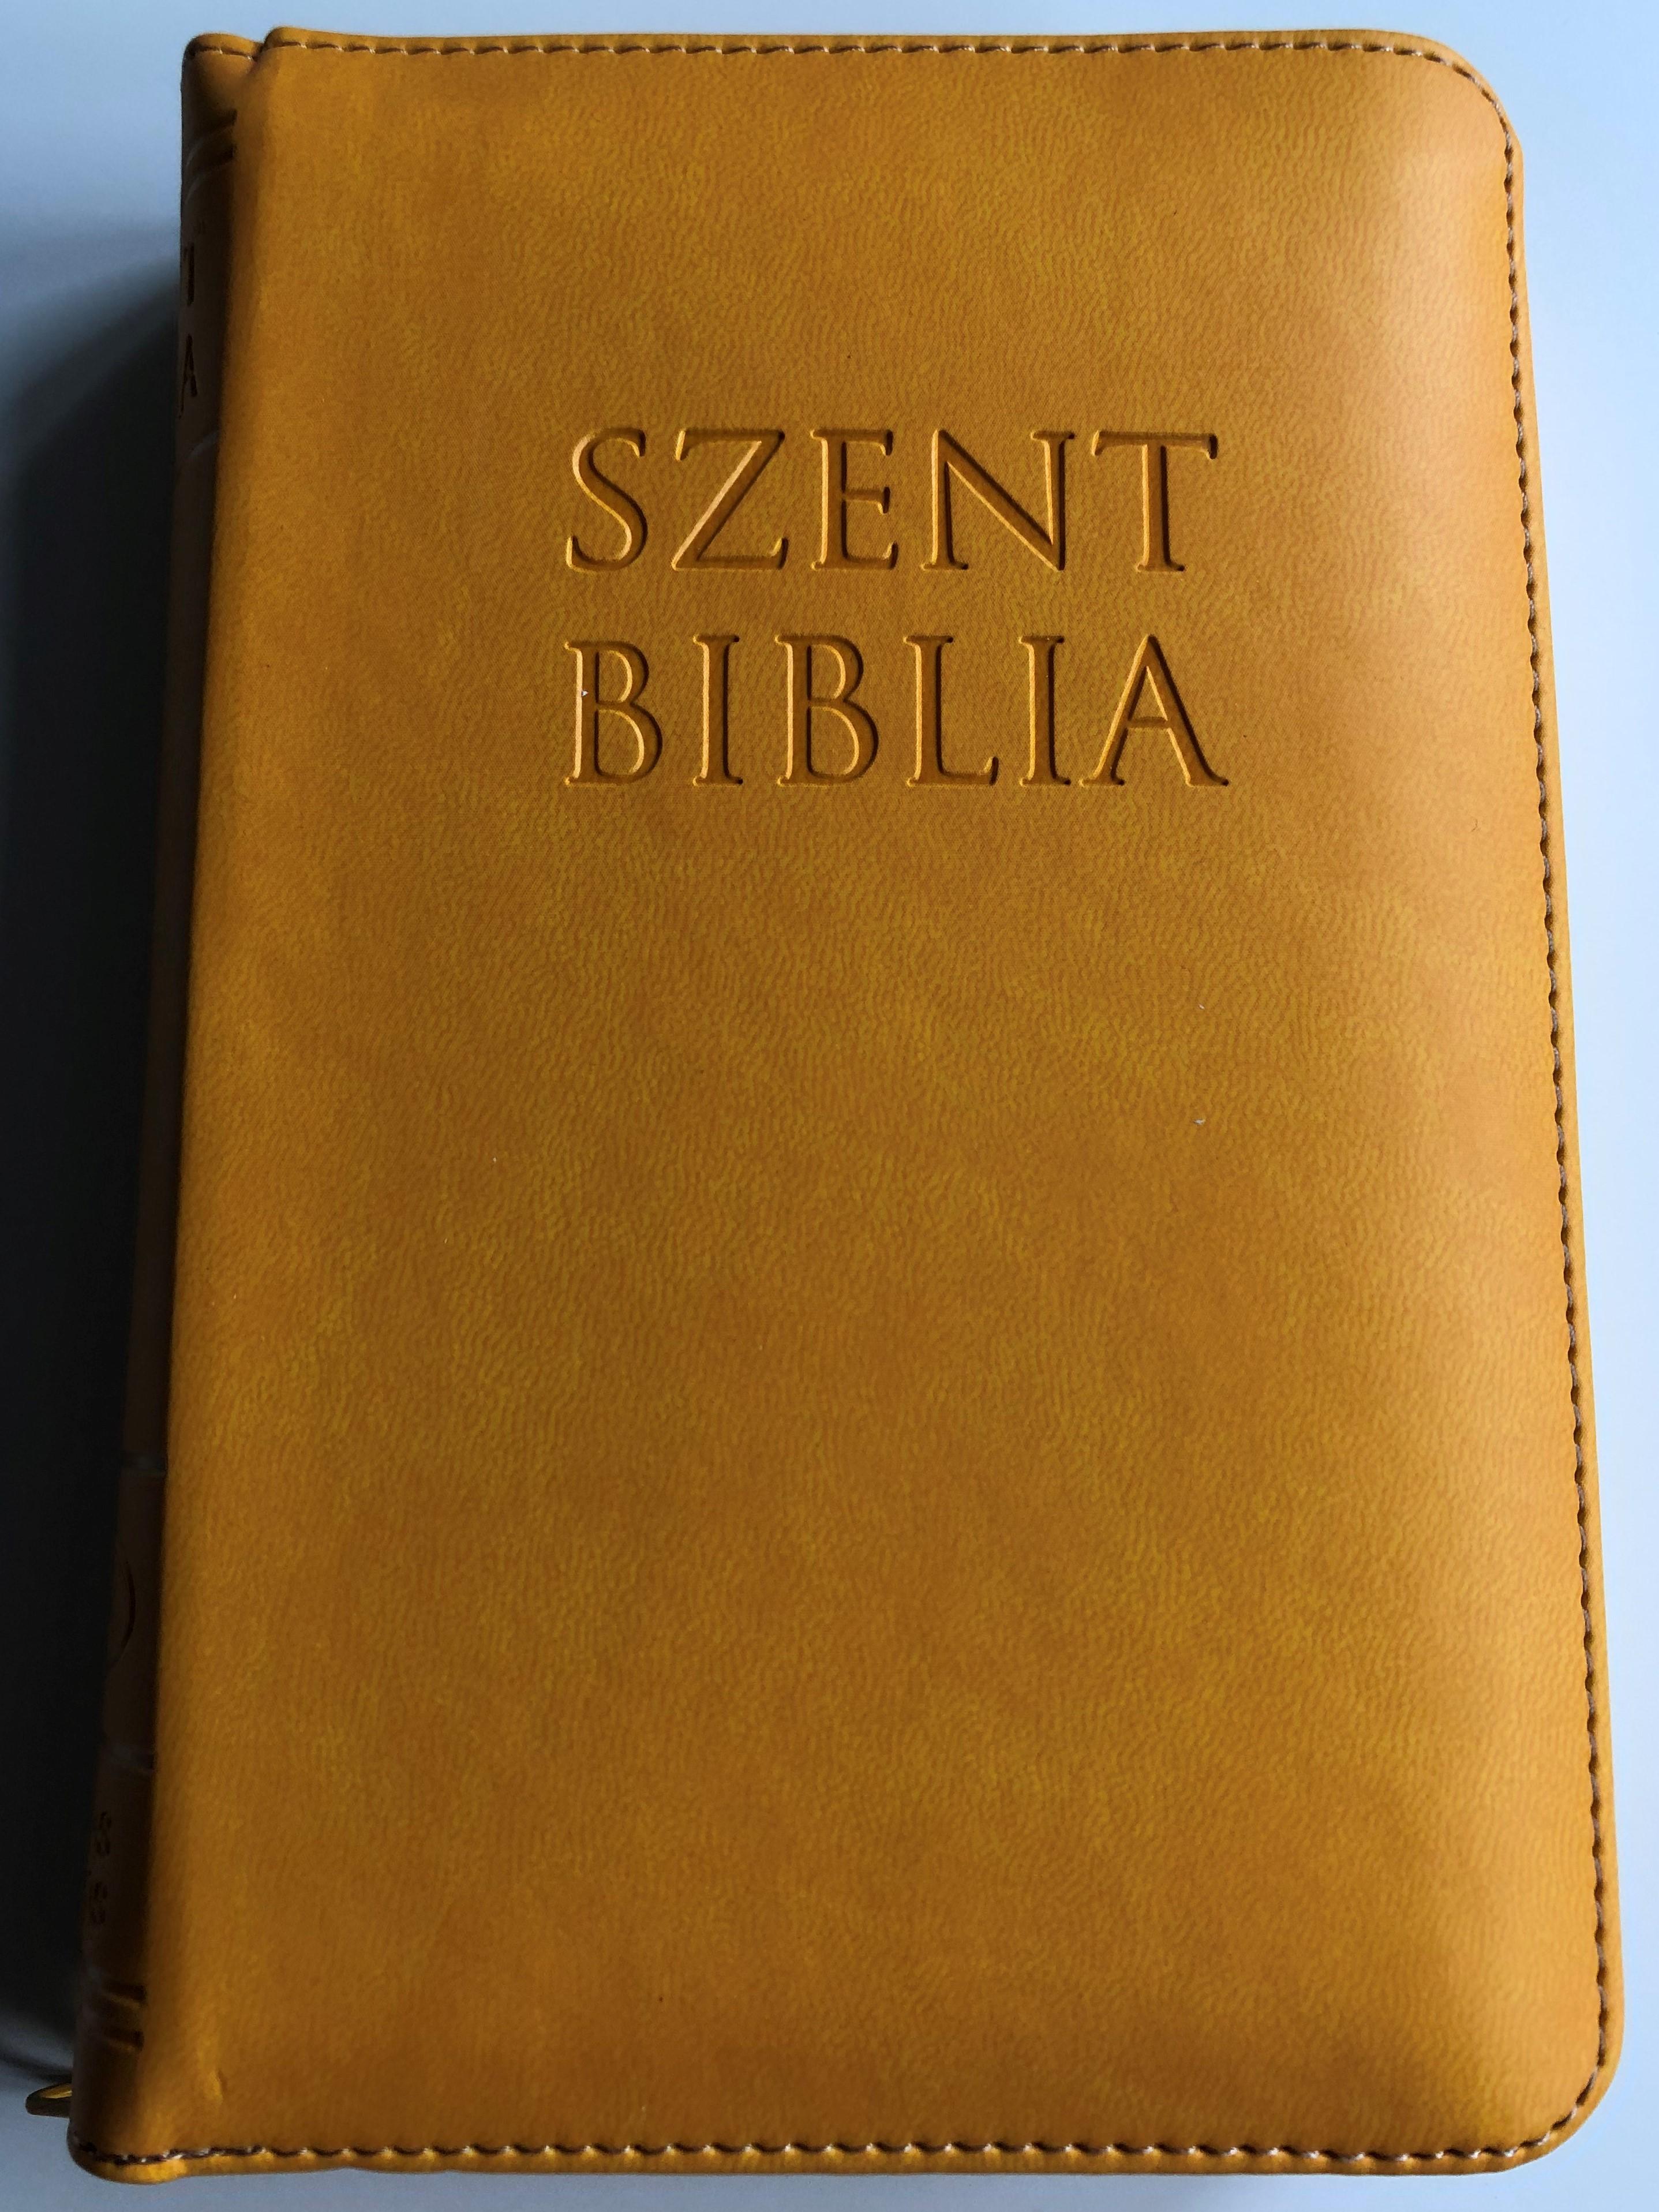 holy-bible-szent-biblia-k-roli-g-sp-r-mall-size-1.jpg